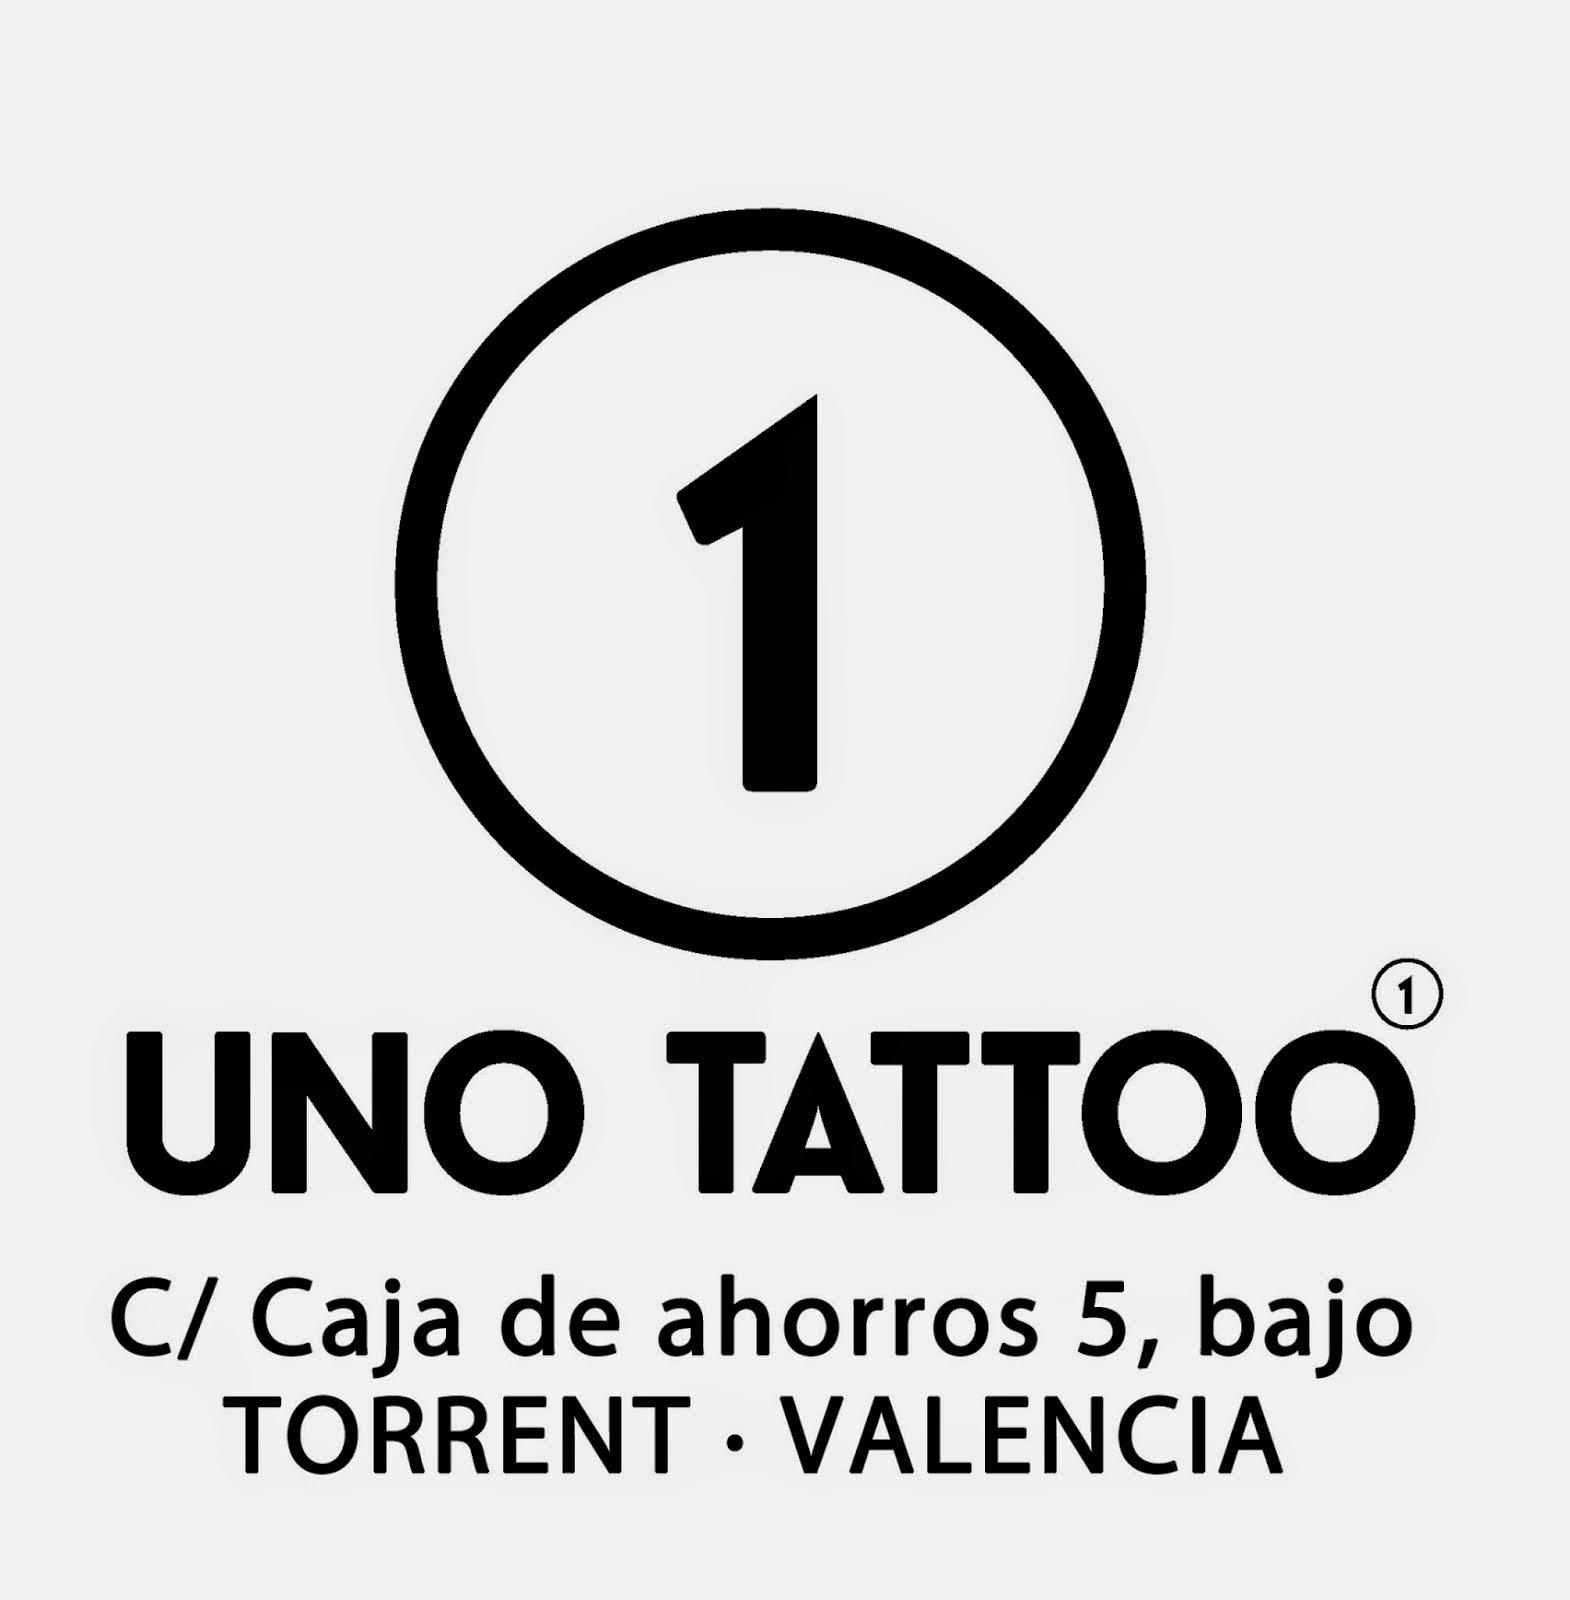 www.facebook.com/uno.tattoo